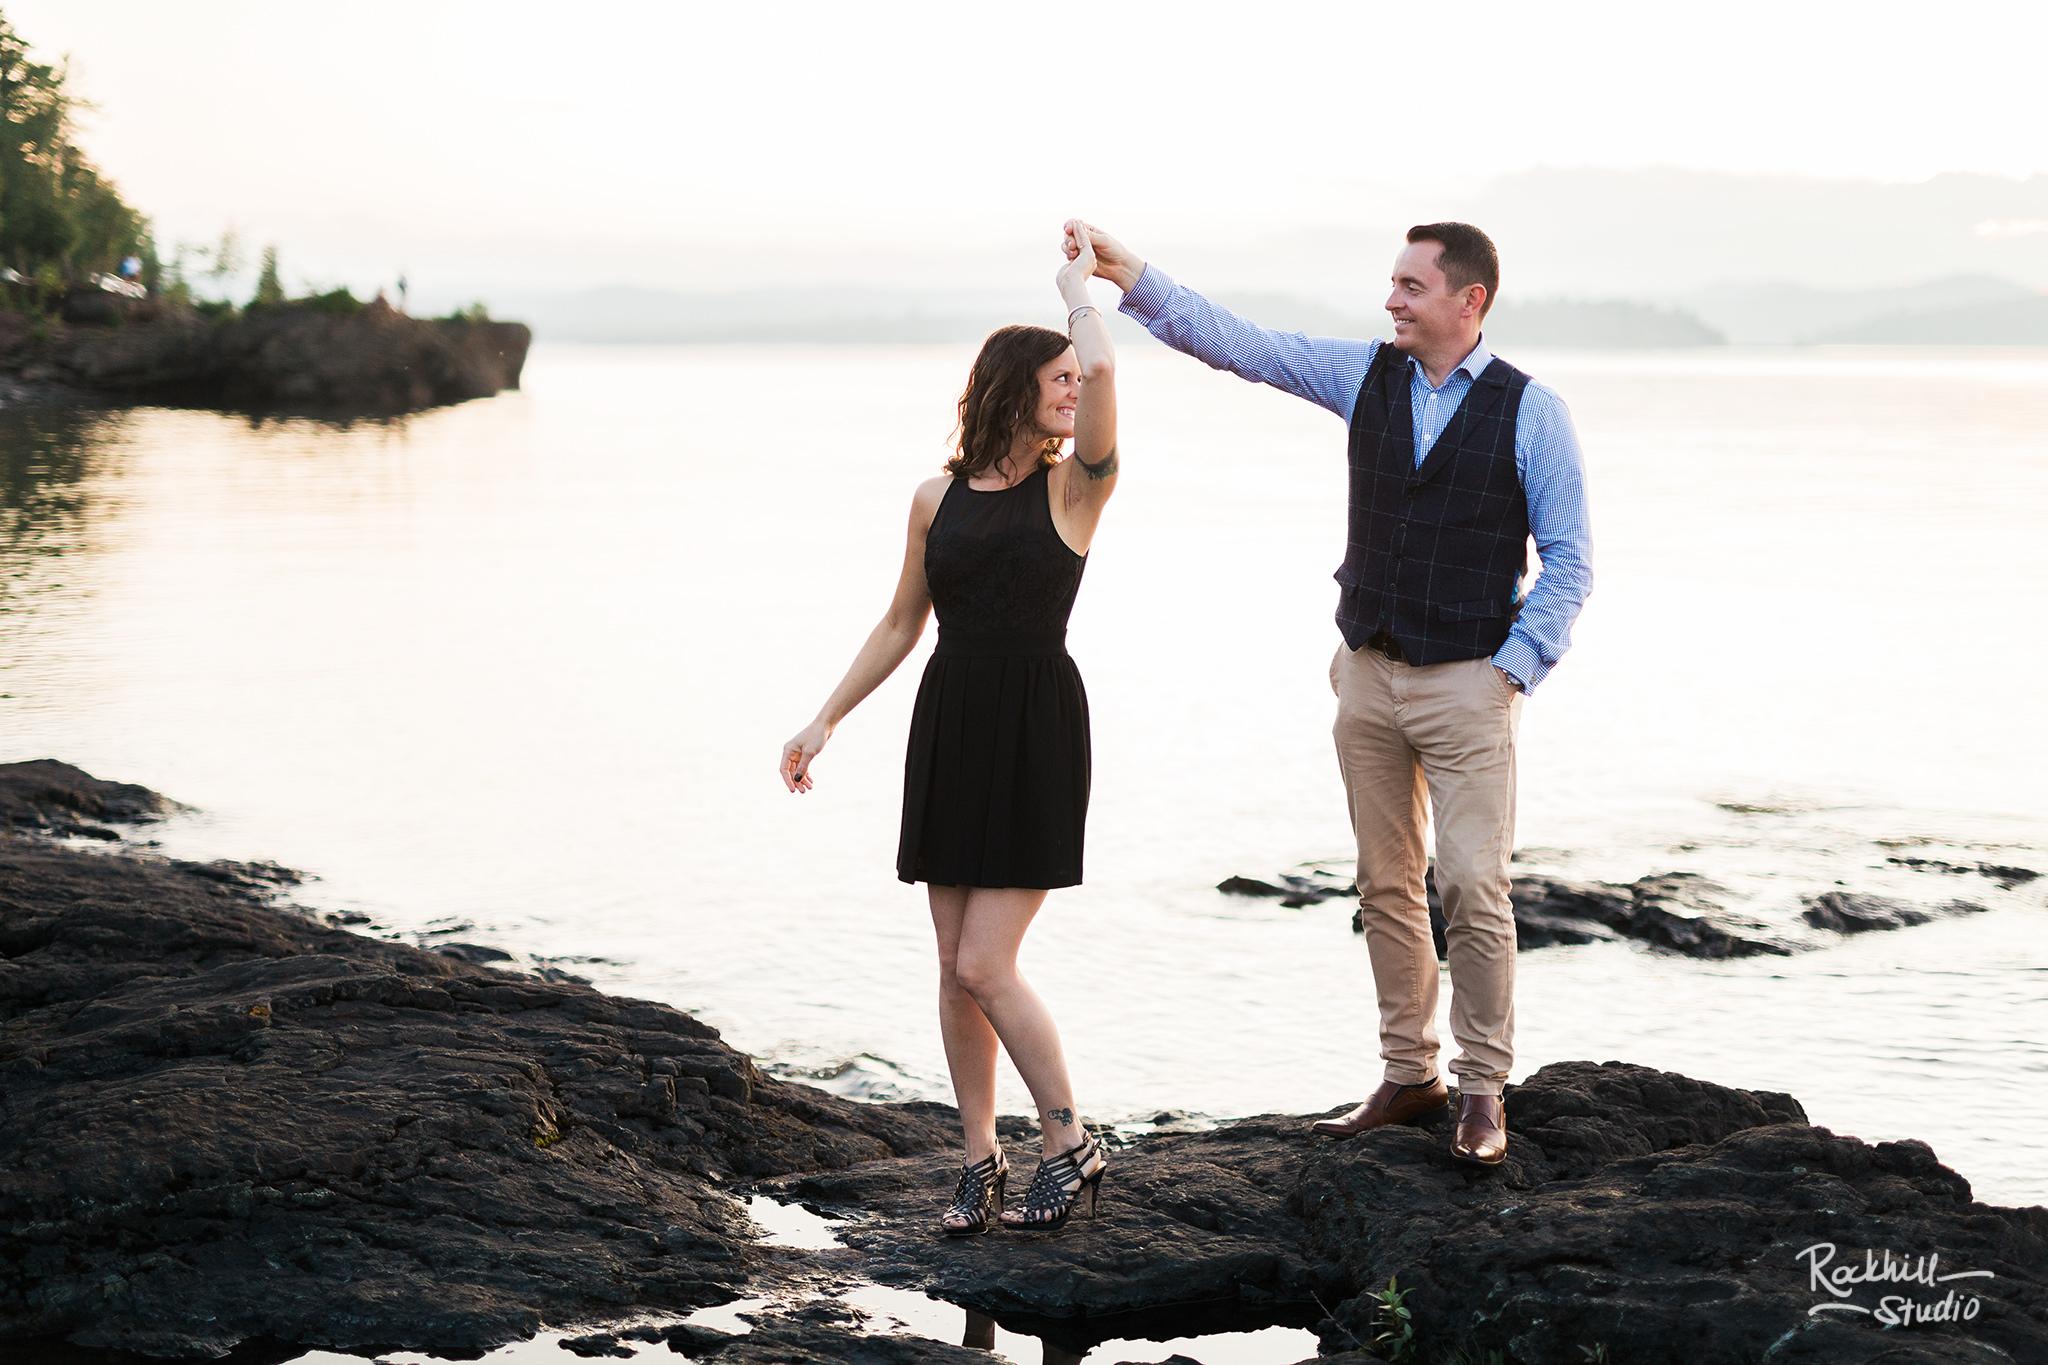 traverse-city-wedding-engagement-rockhill-casey-del-16.jpg